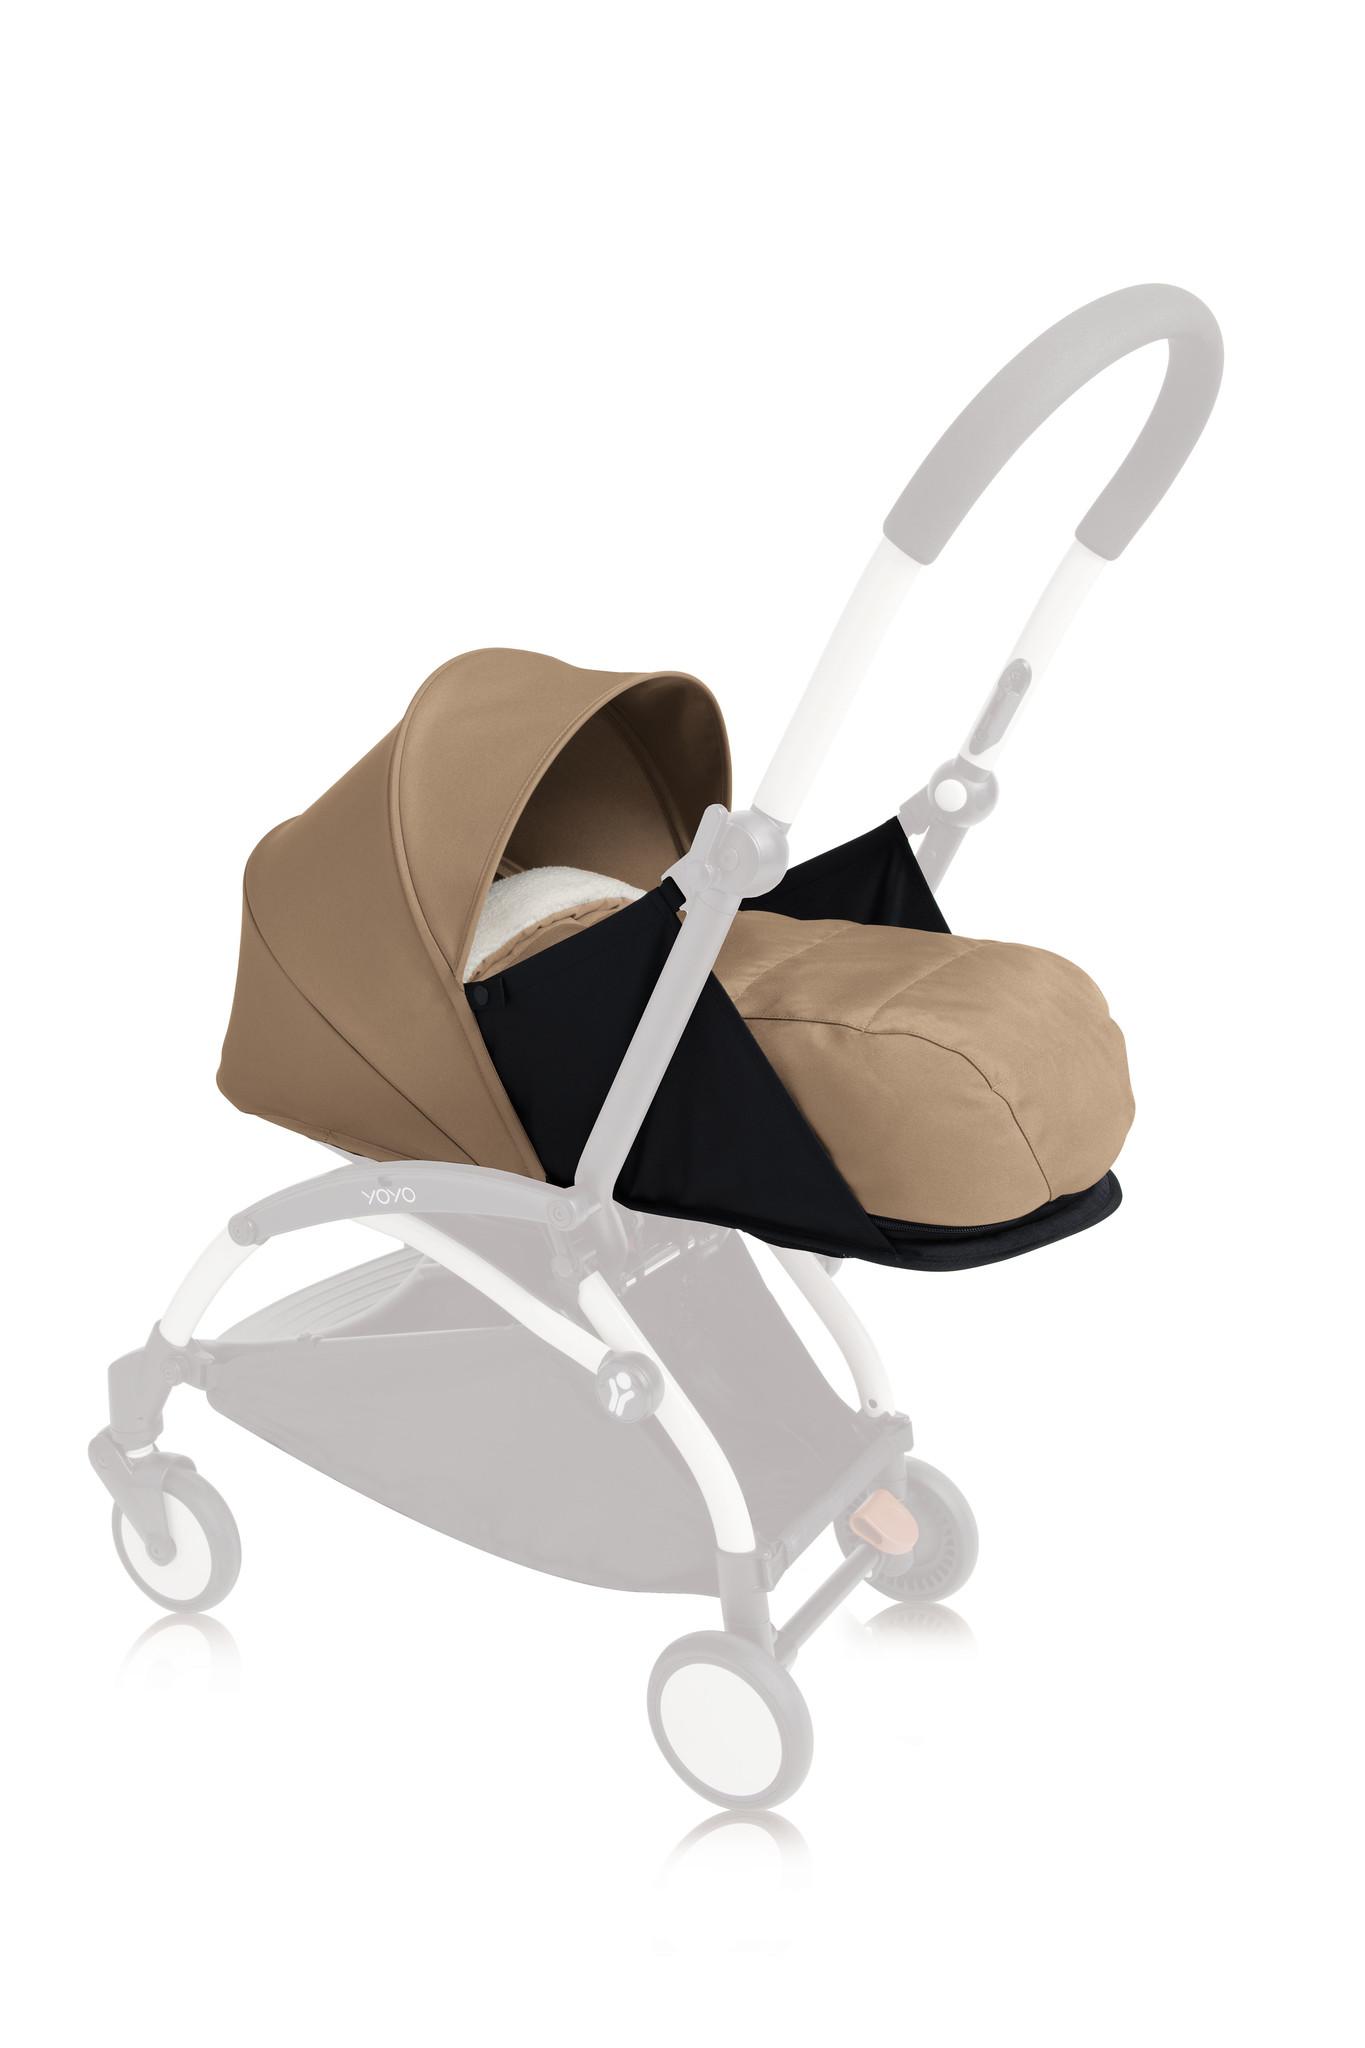 Babyzen Babyzen Yoyo 0+ Newborn Pack - Taupe 2020